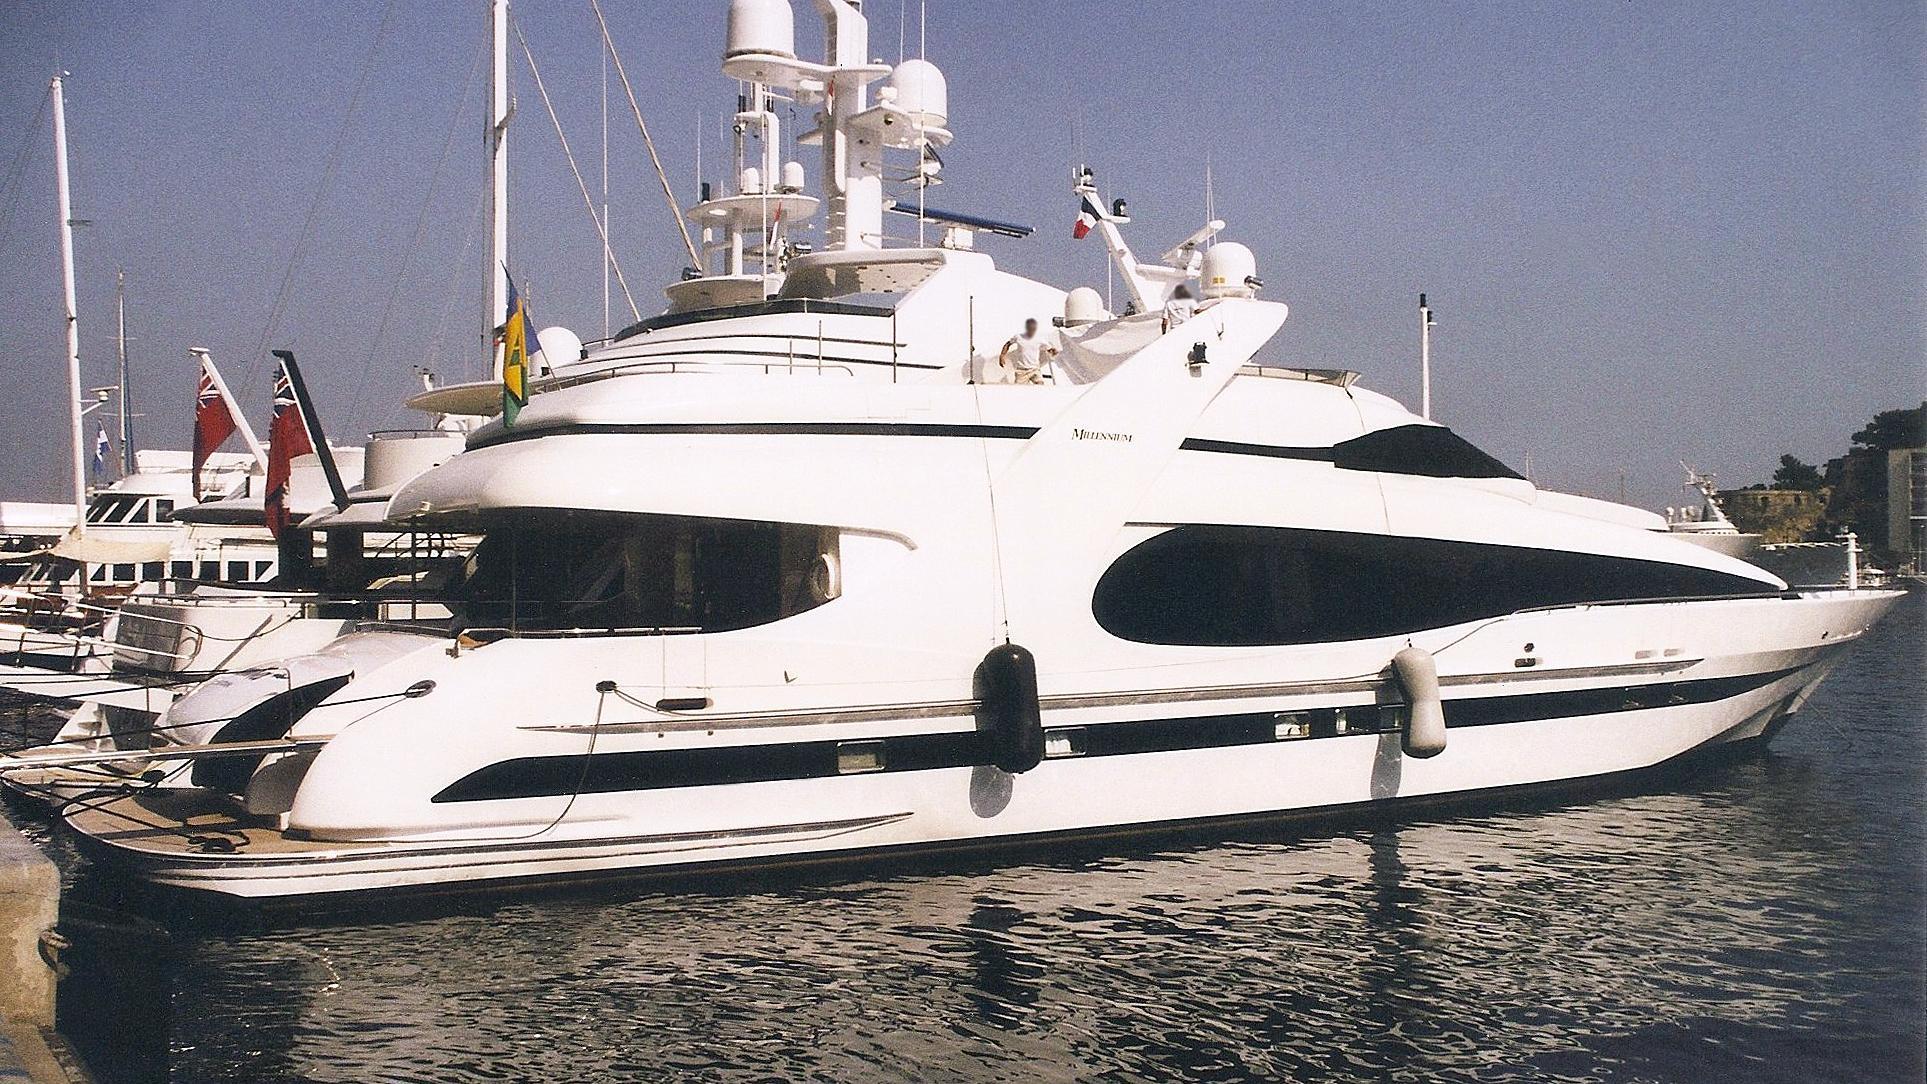 phantom-motoryacht-gulf-craft-2001-36m-profile